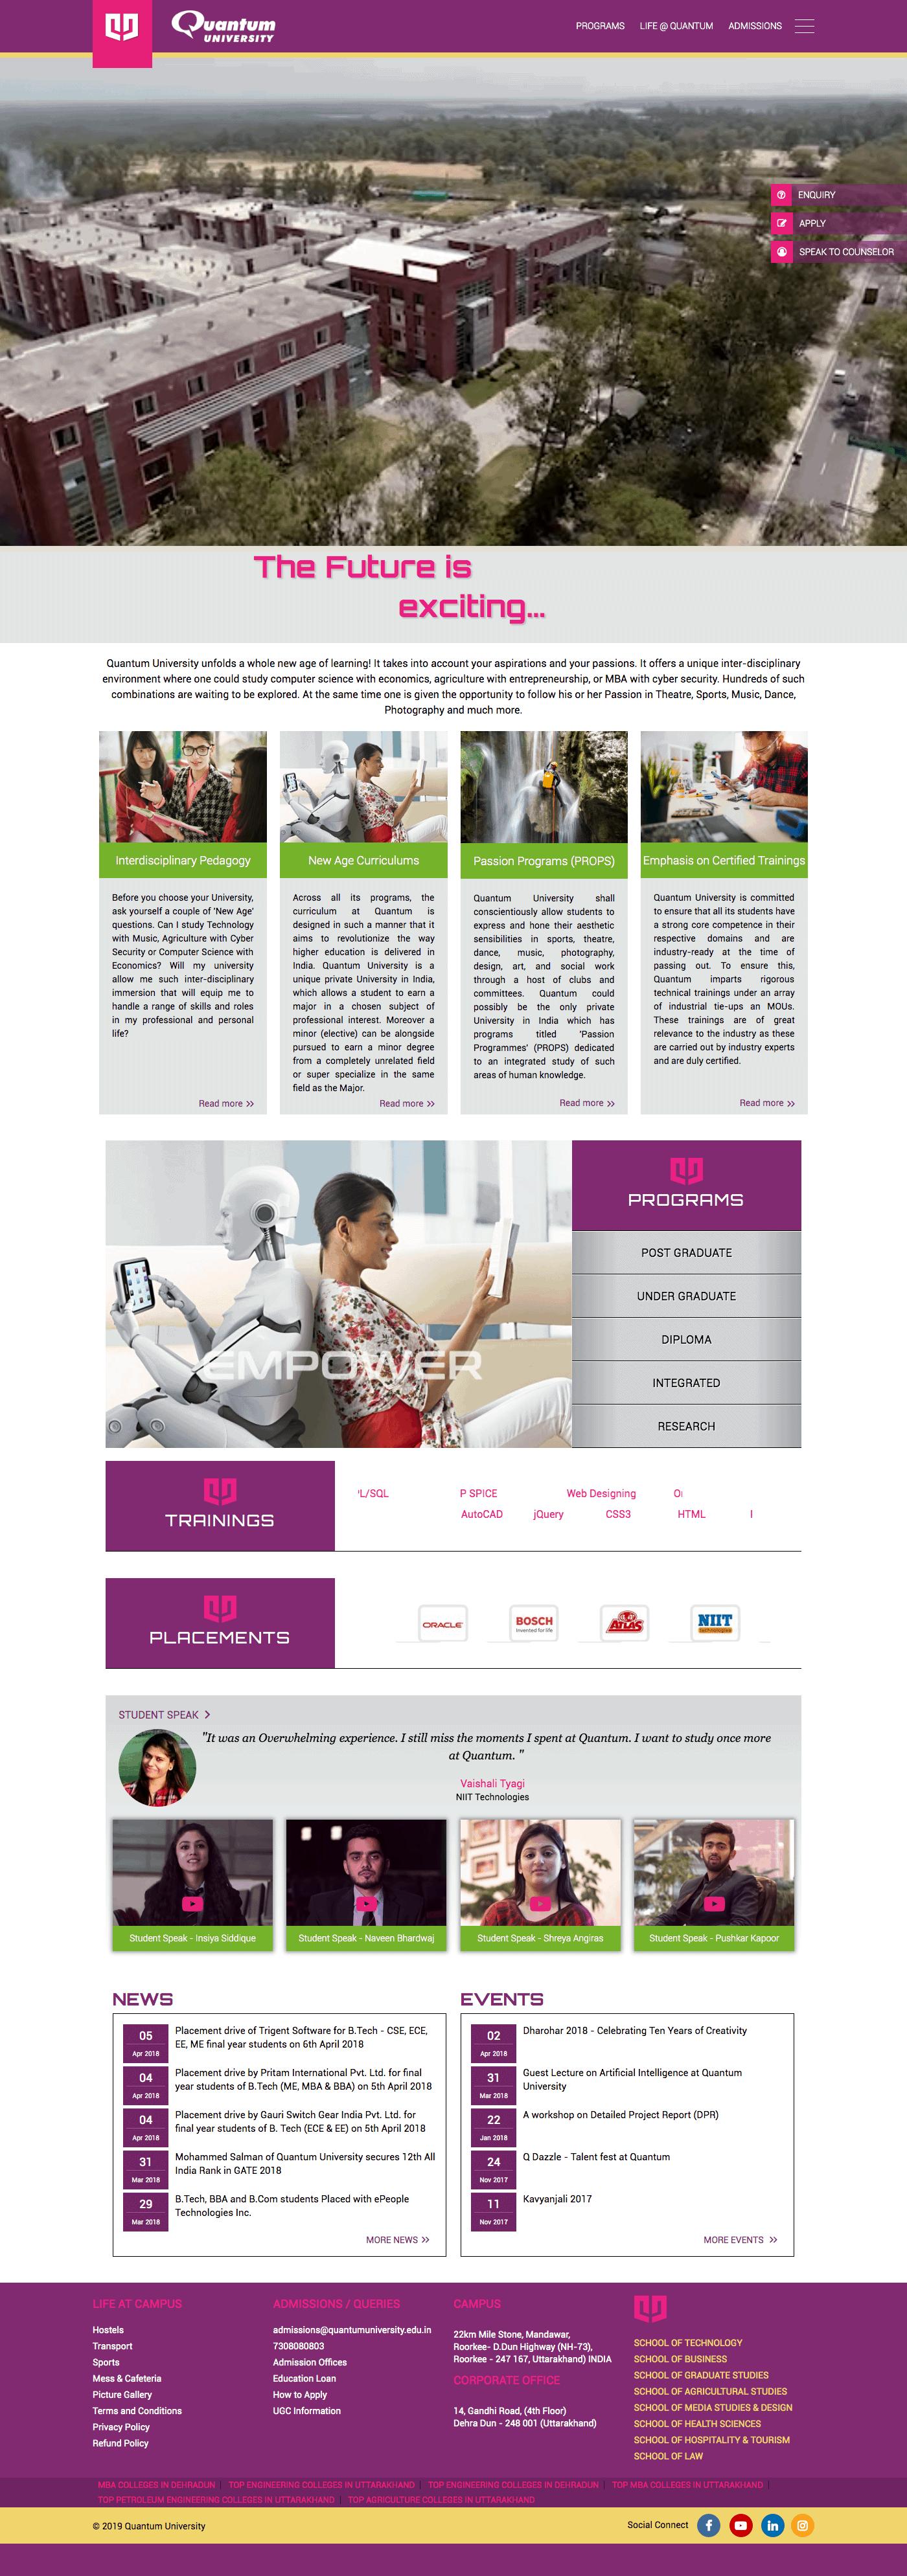 Best Website Design & Top Web Development Company in Dehradun